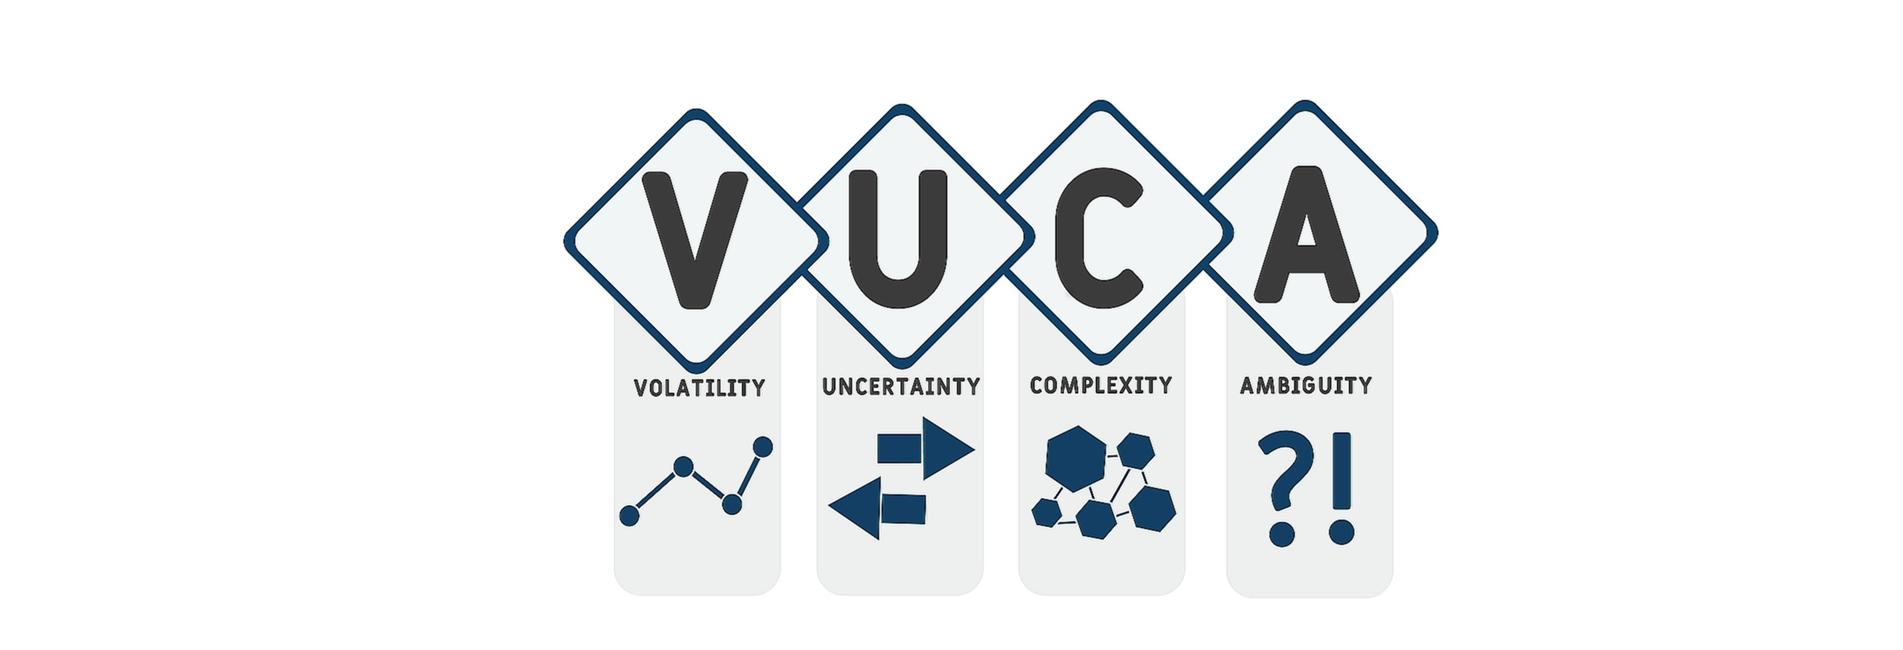 Vuca_Shutterstock_Richtig_skaliert